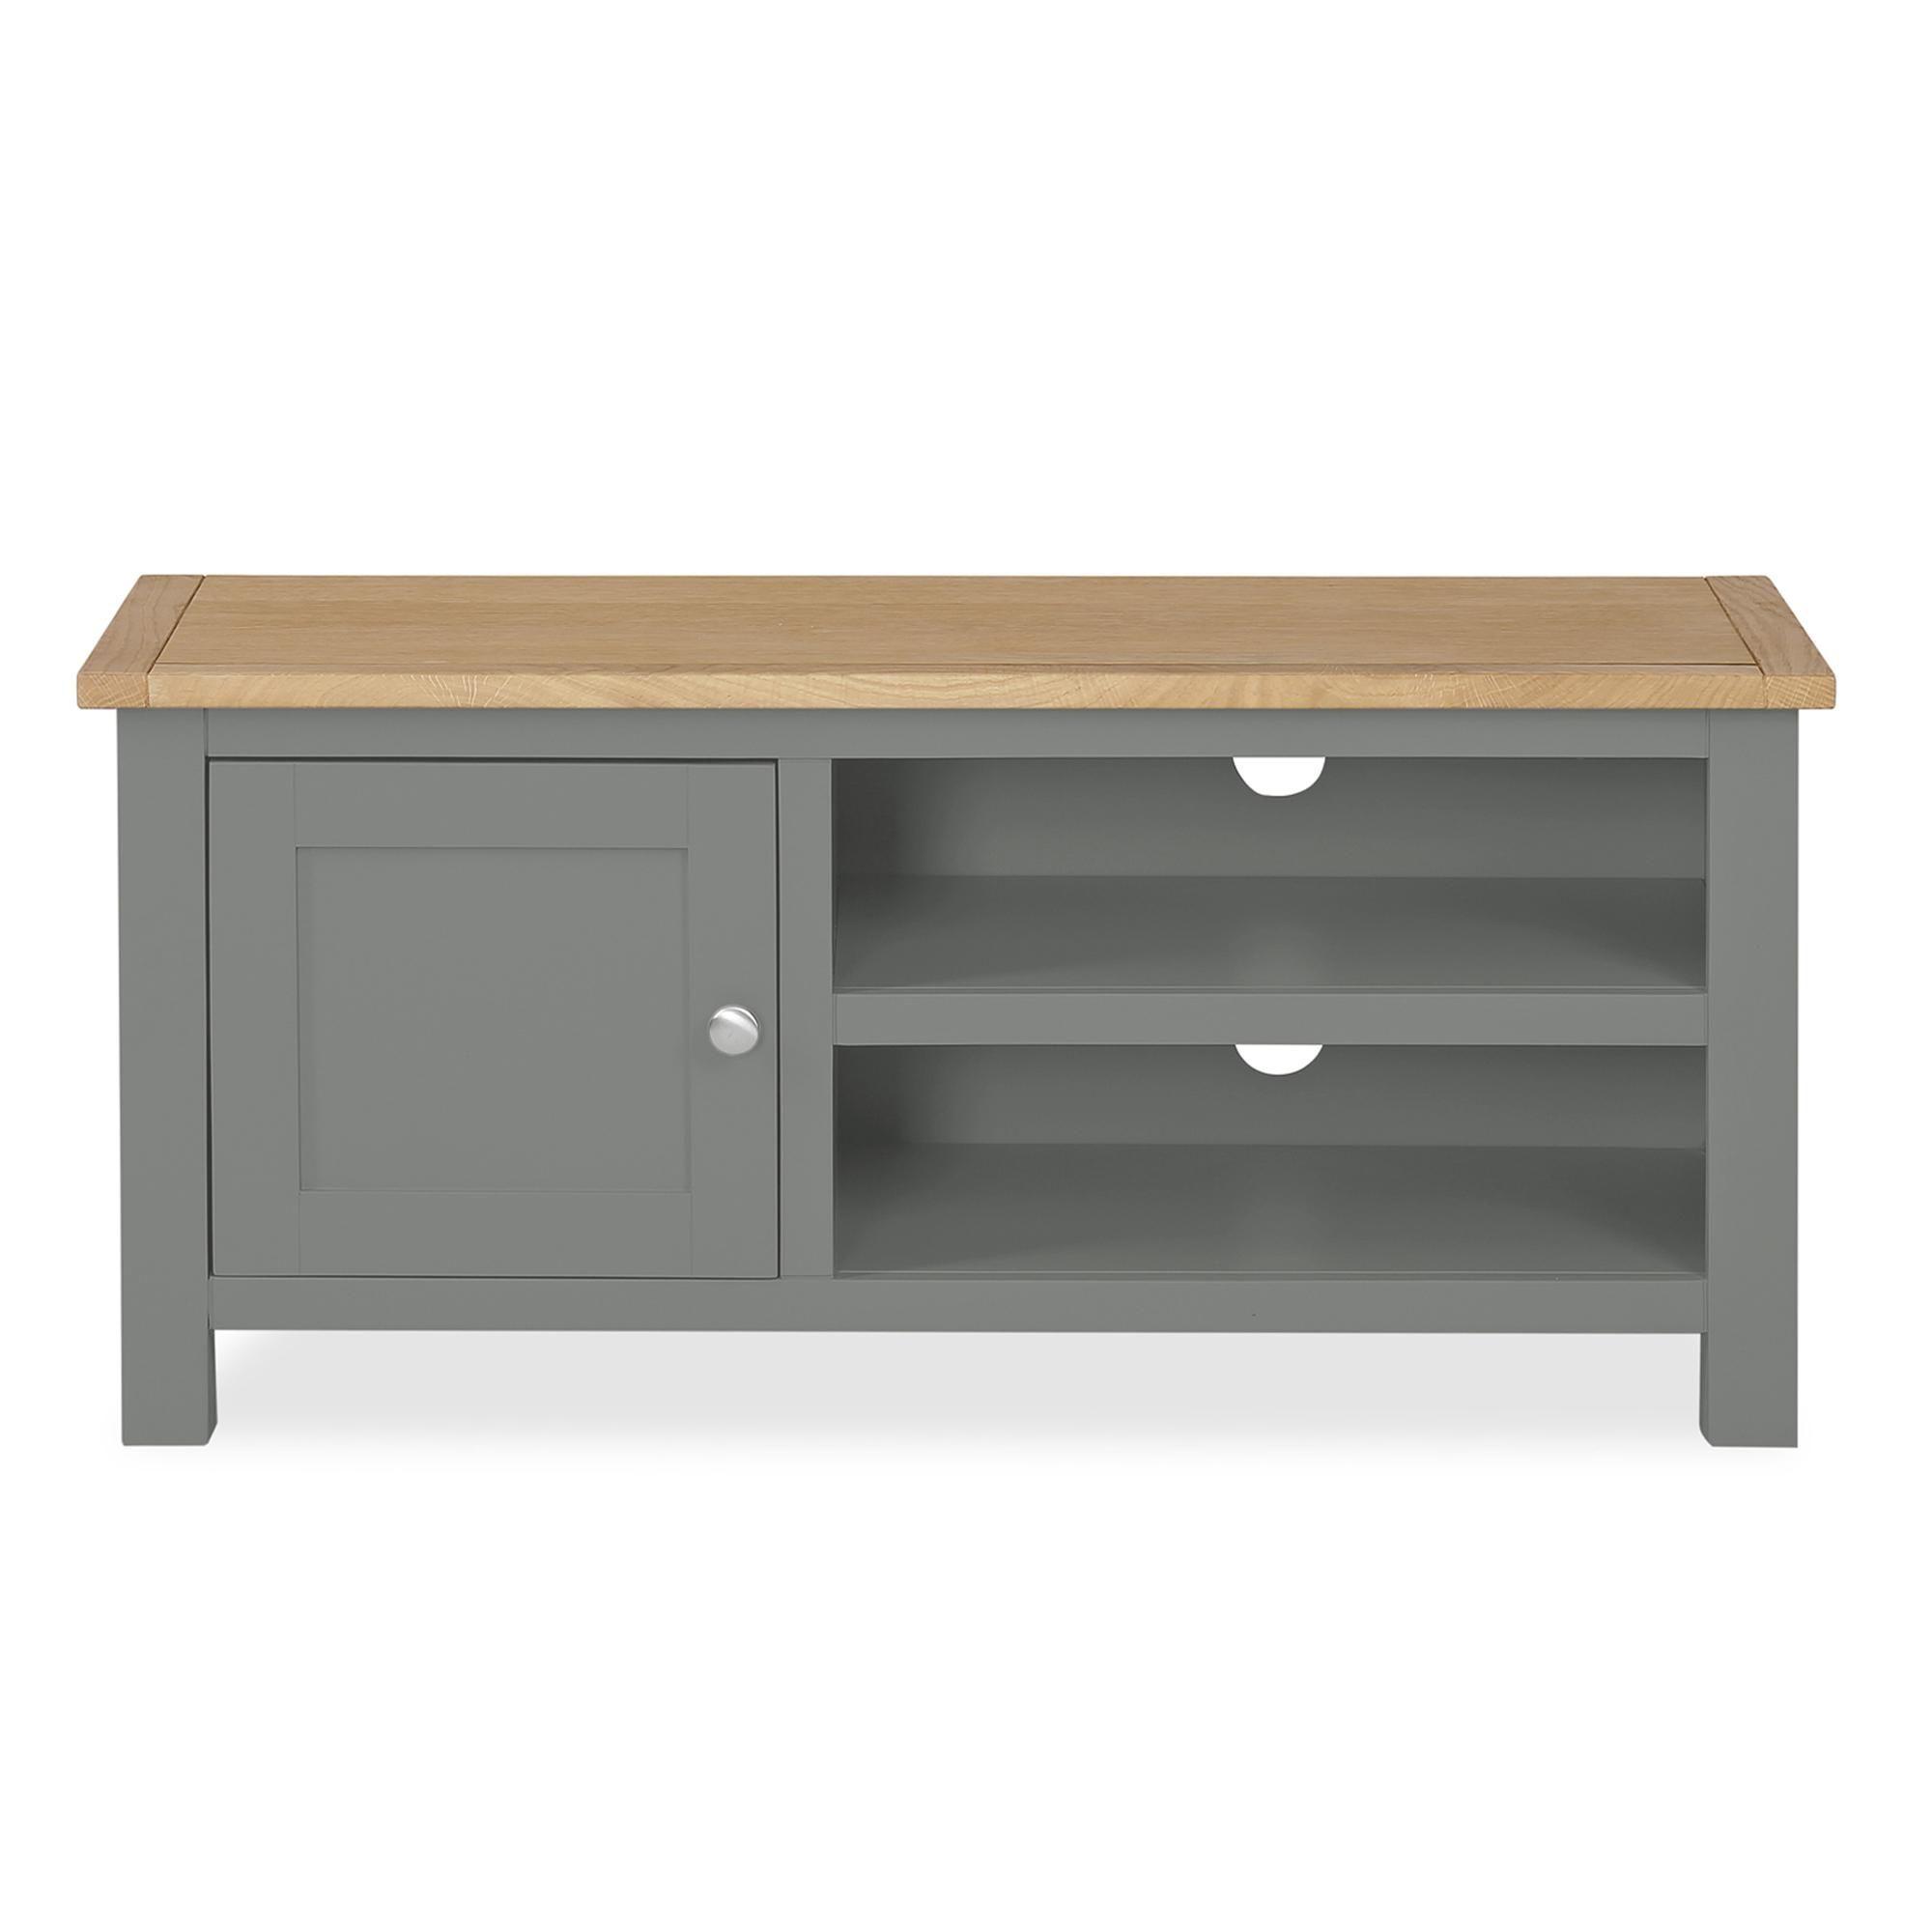 Ready Assembled Grey Living Room Furniture – Dlivingroomku Inside Bromley Grey Corner Tv Stands (View 5 of 20)